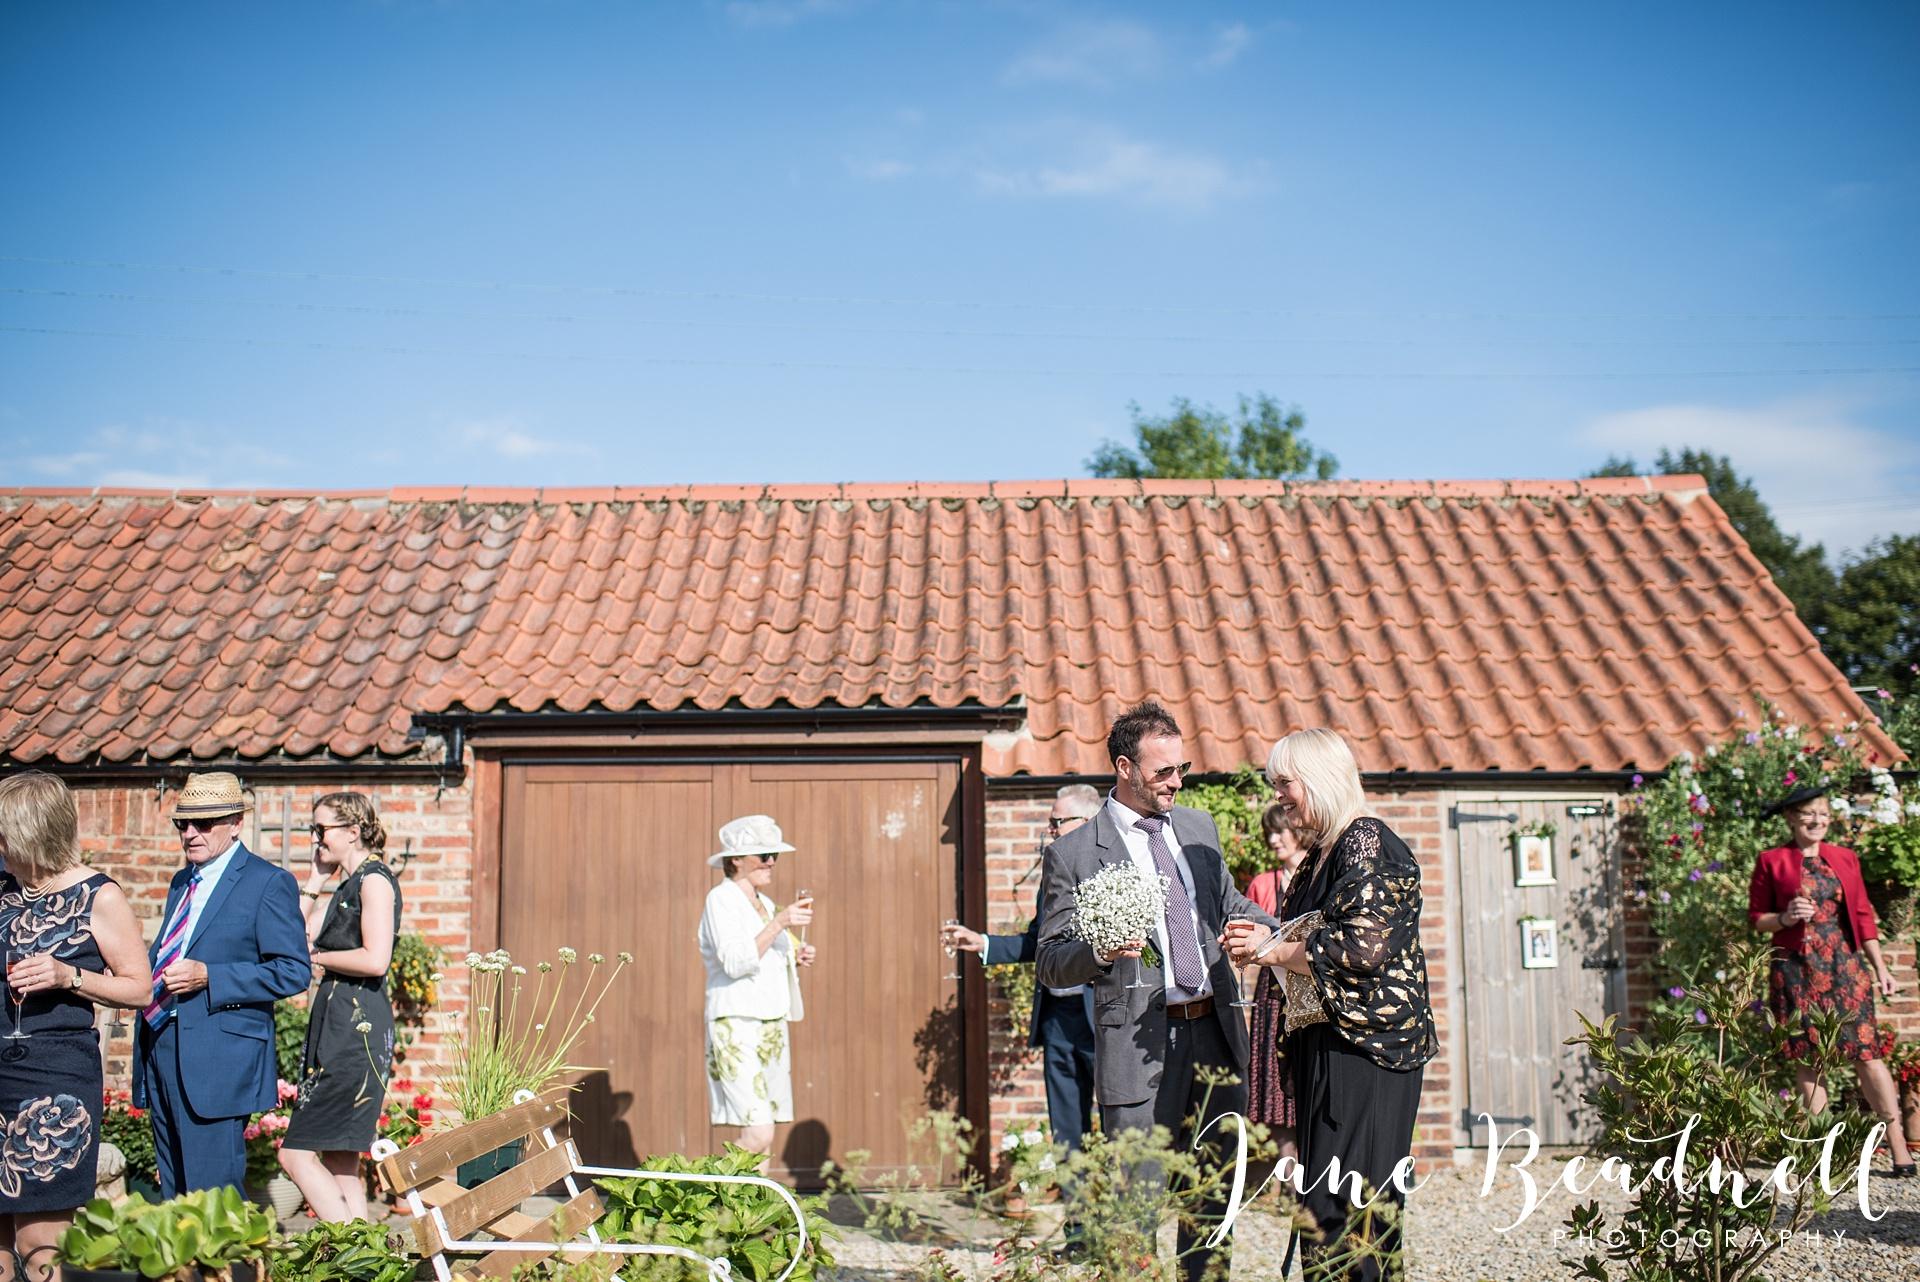 fine-art-wedding-photographer-jane-beadnell-yorkshire-wedding-photographer-garden-wedding_0075